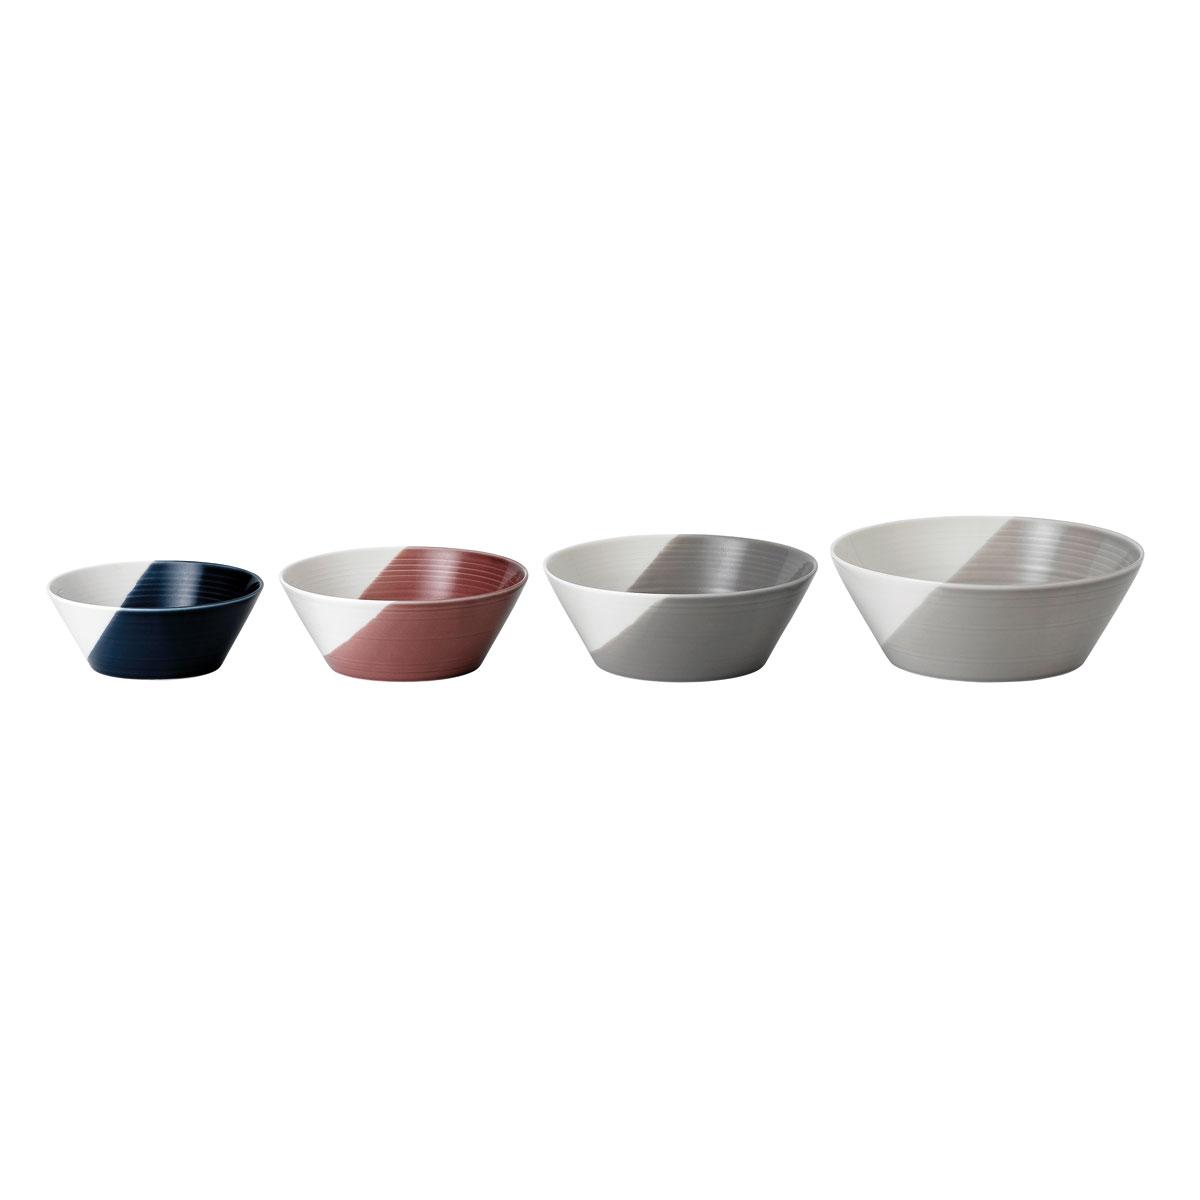 Royal Doulton Bowls Of Plenty Nesting Bowl Set of 4